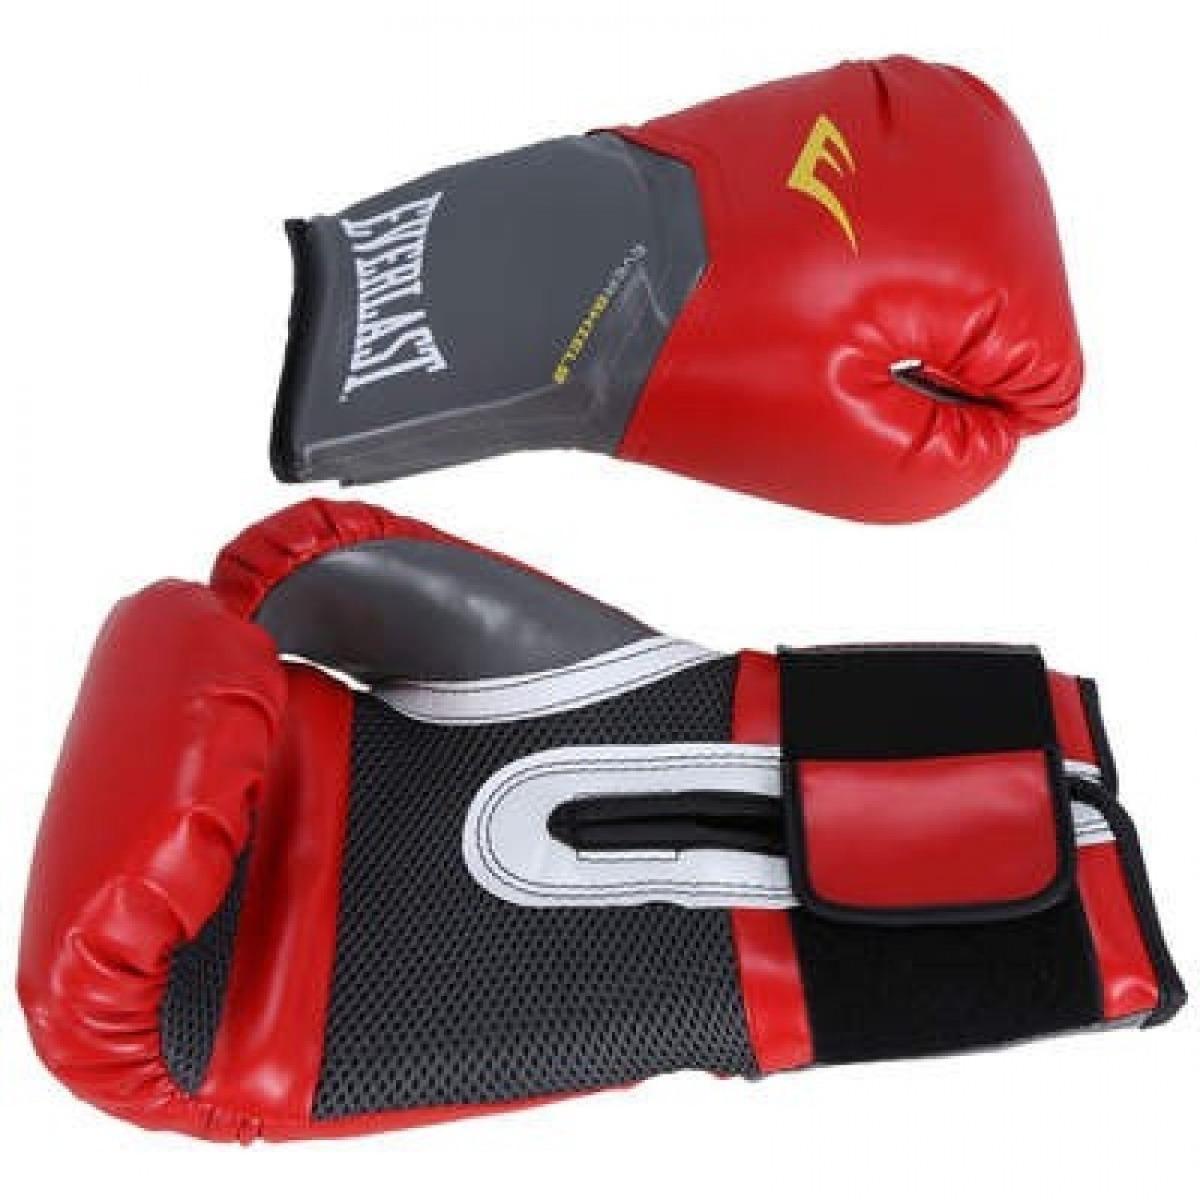 luva boxe everlast pro style elite training 16 oz vermelha. Carregando zoom. ade837e610f3d